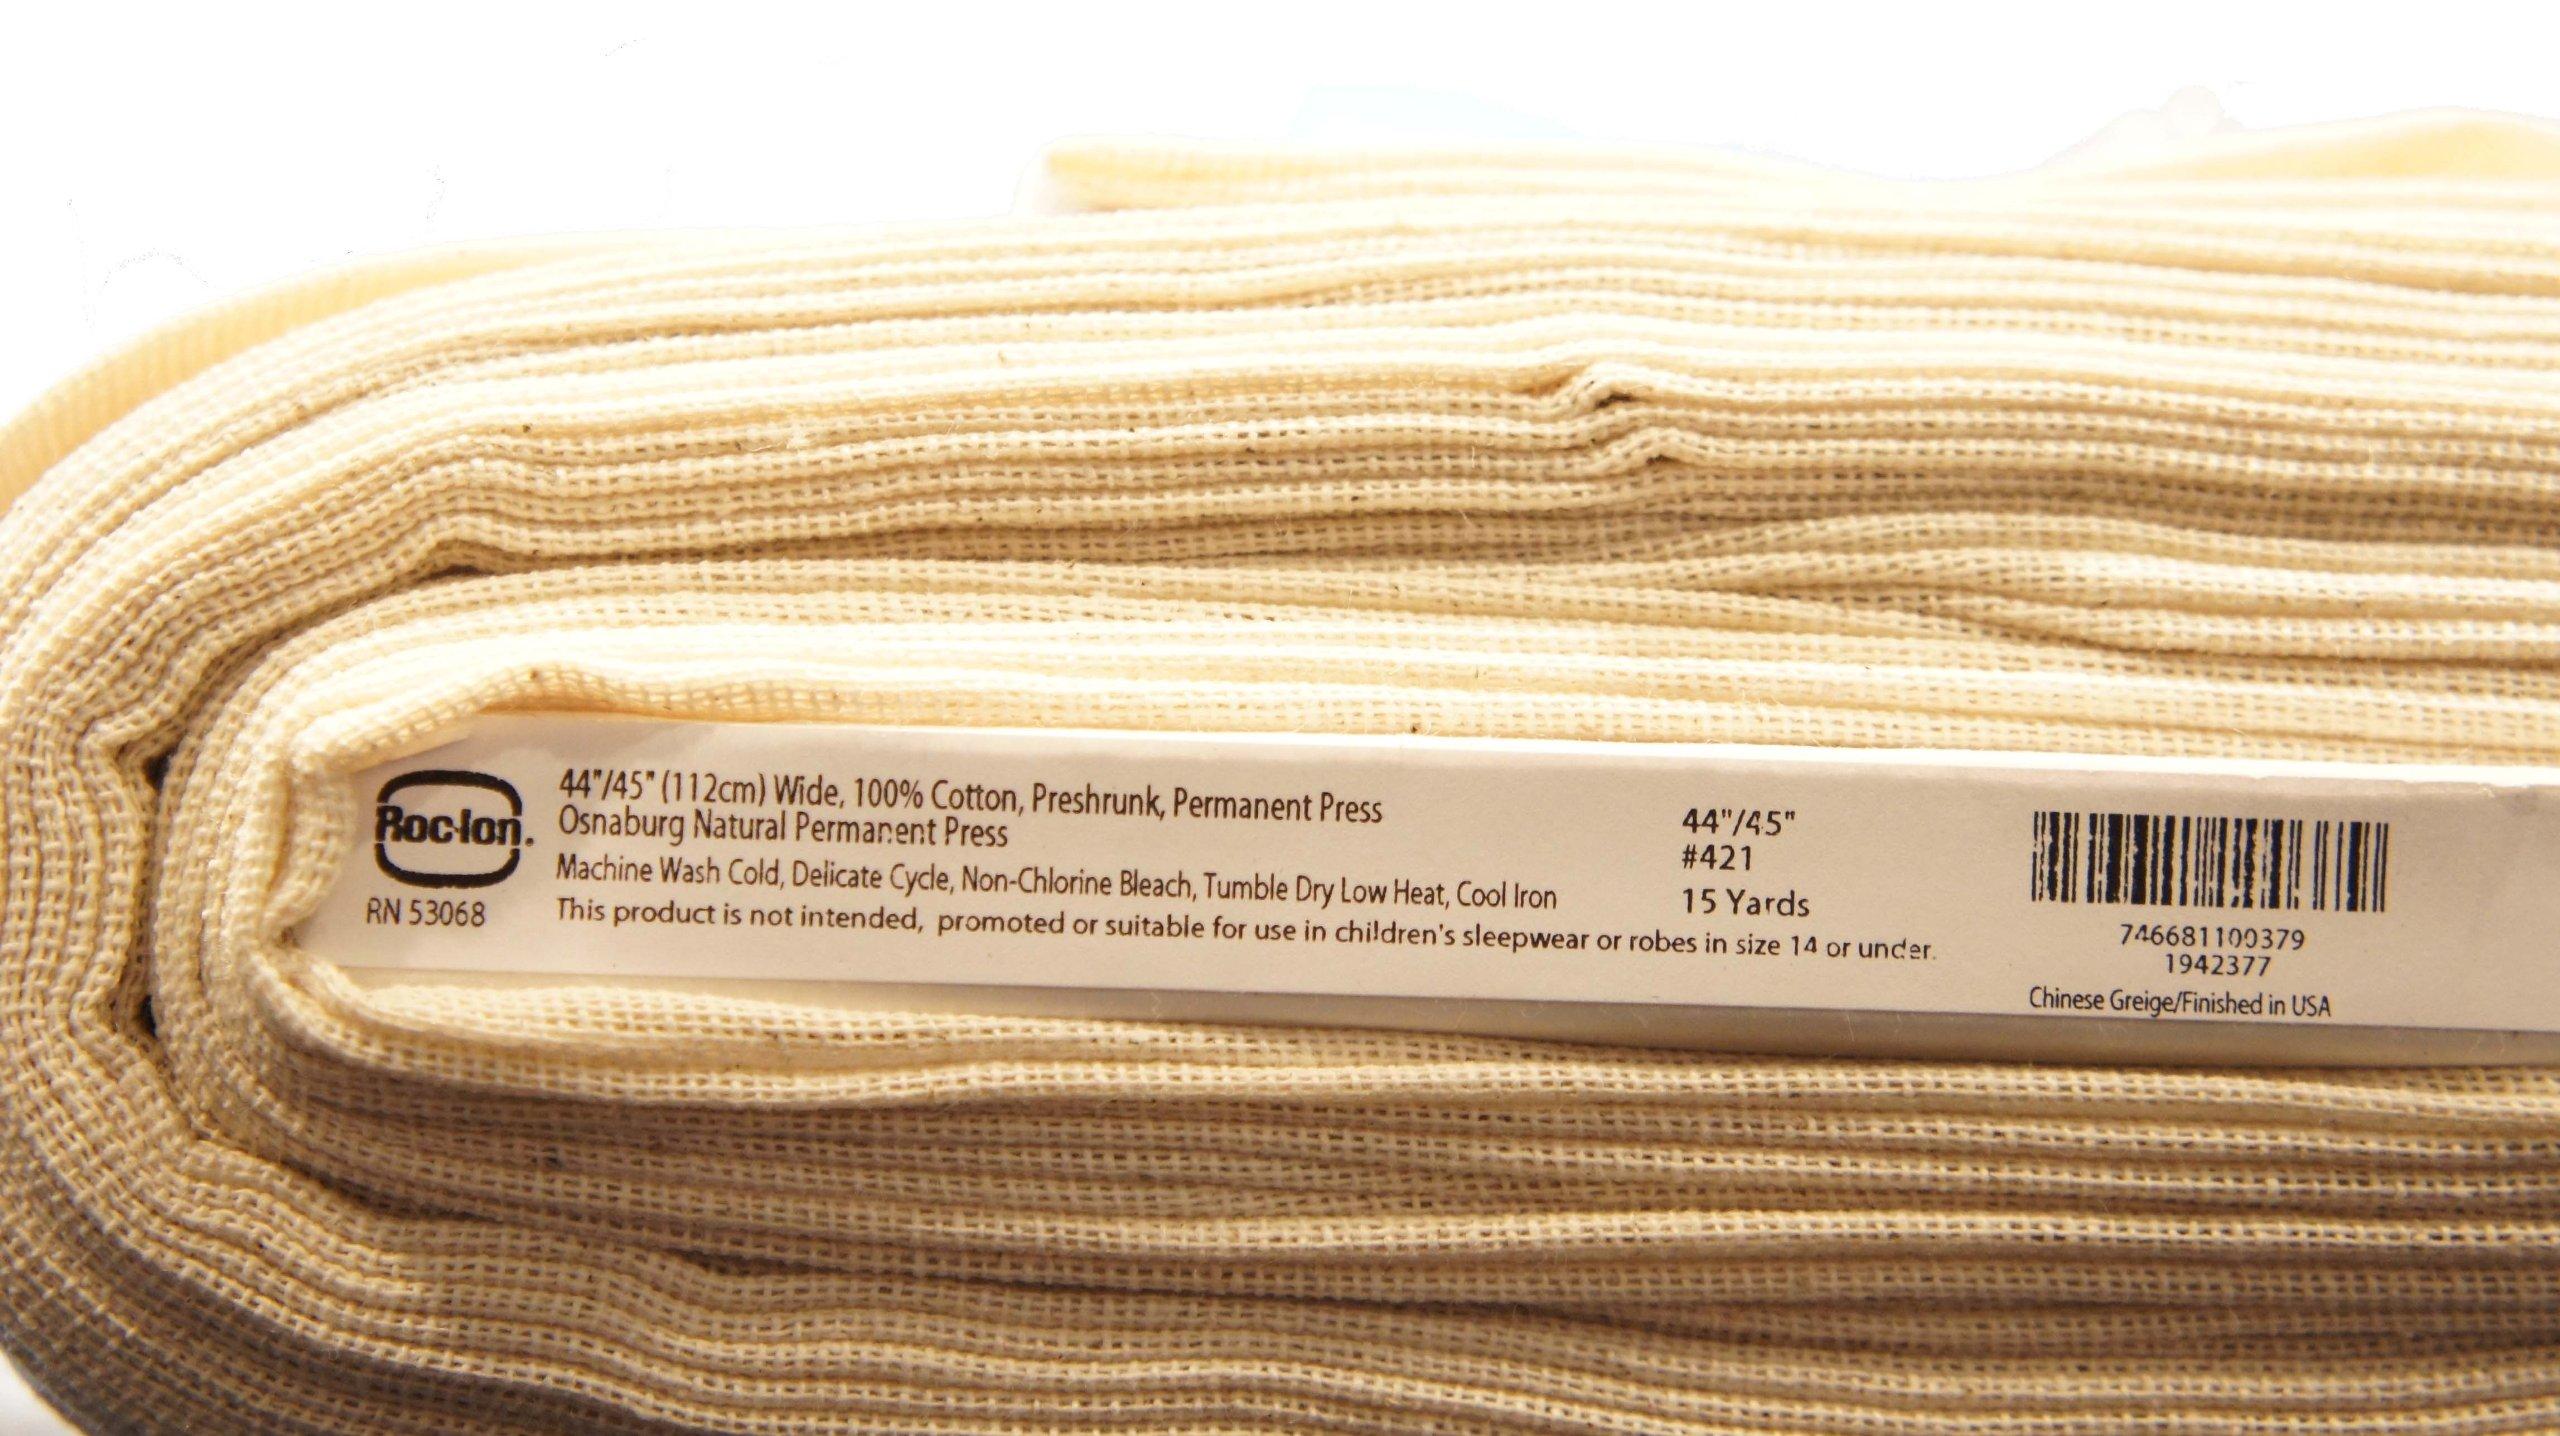 Unbleached Osnaburg 45'' 100% Cotton 25yd Bolt-Natural